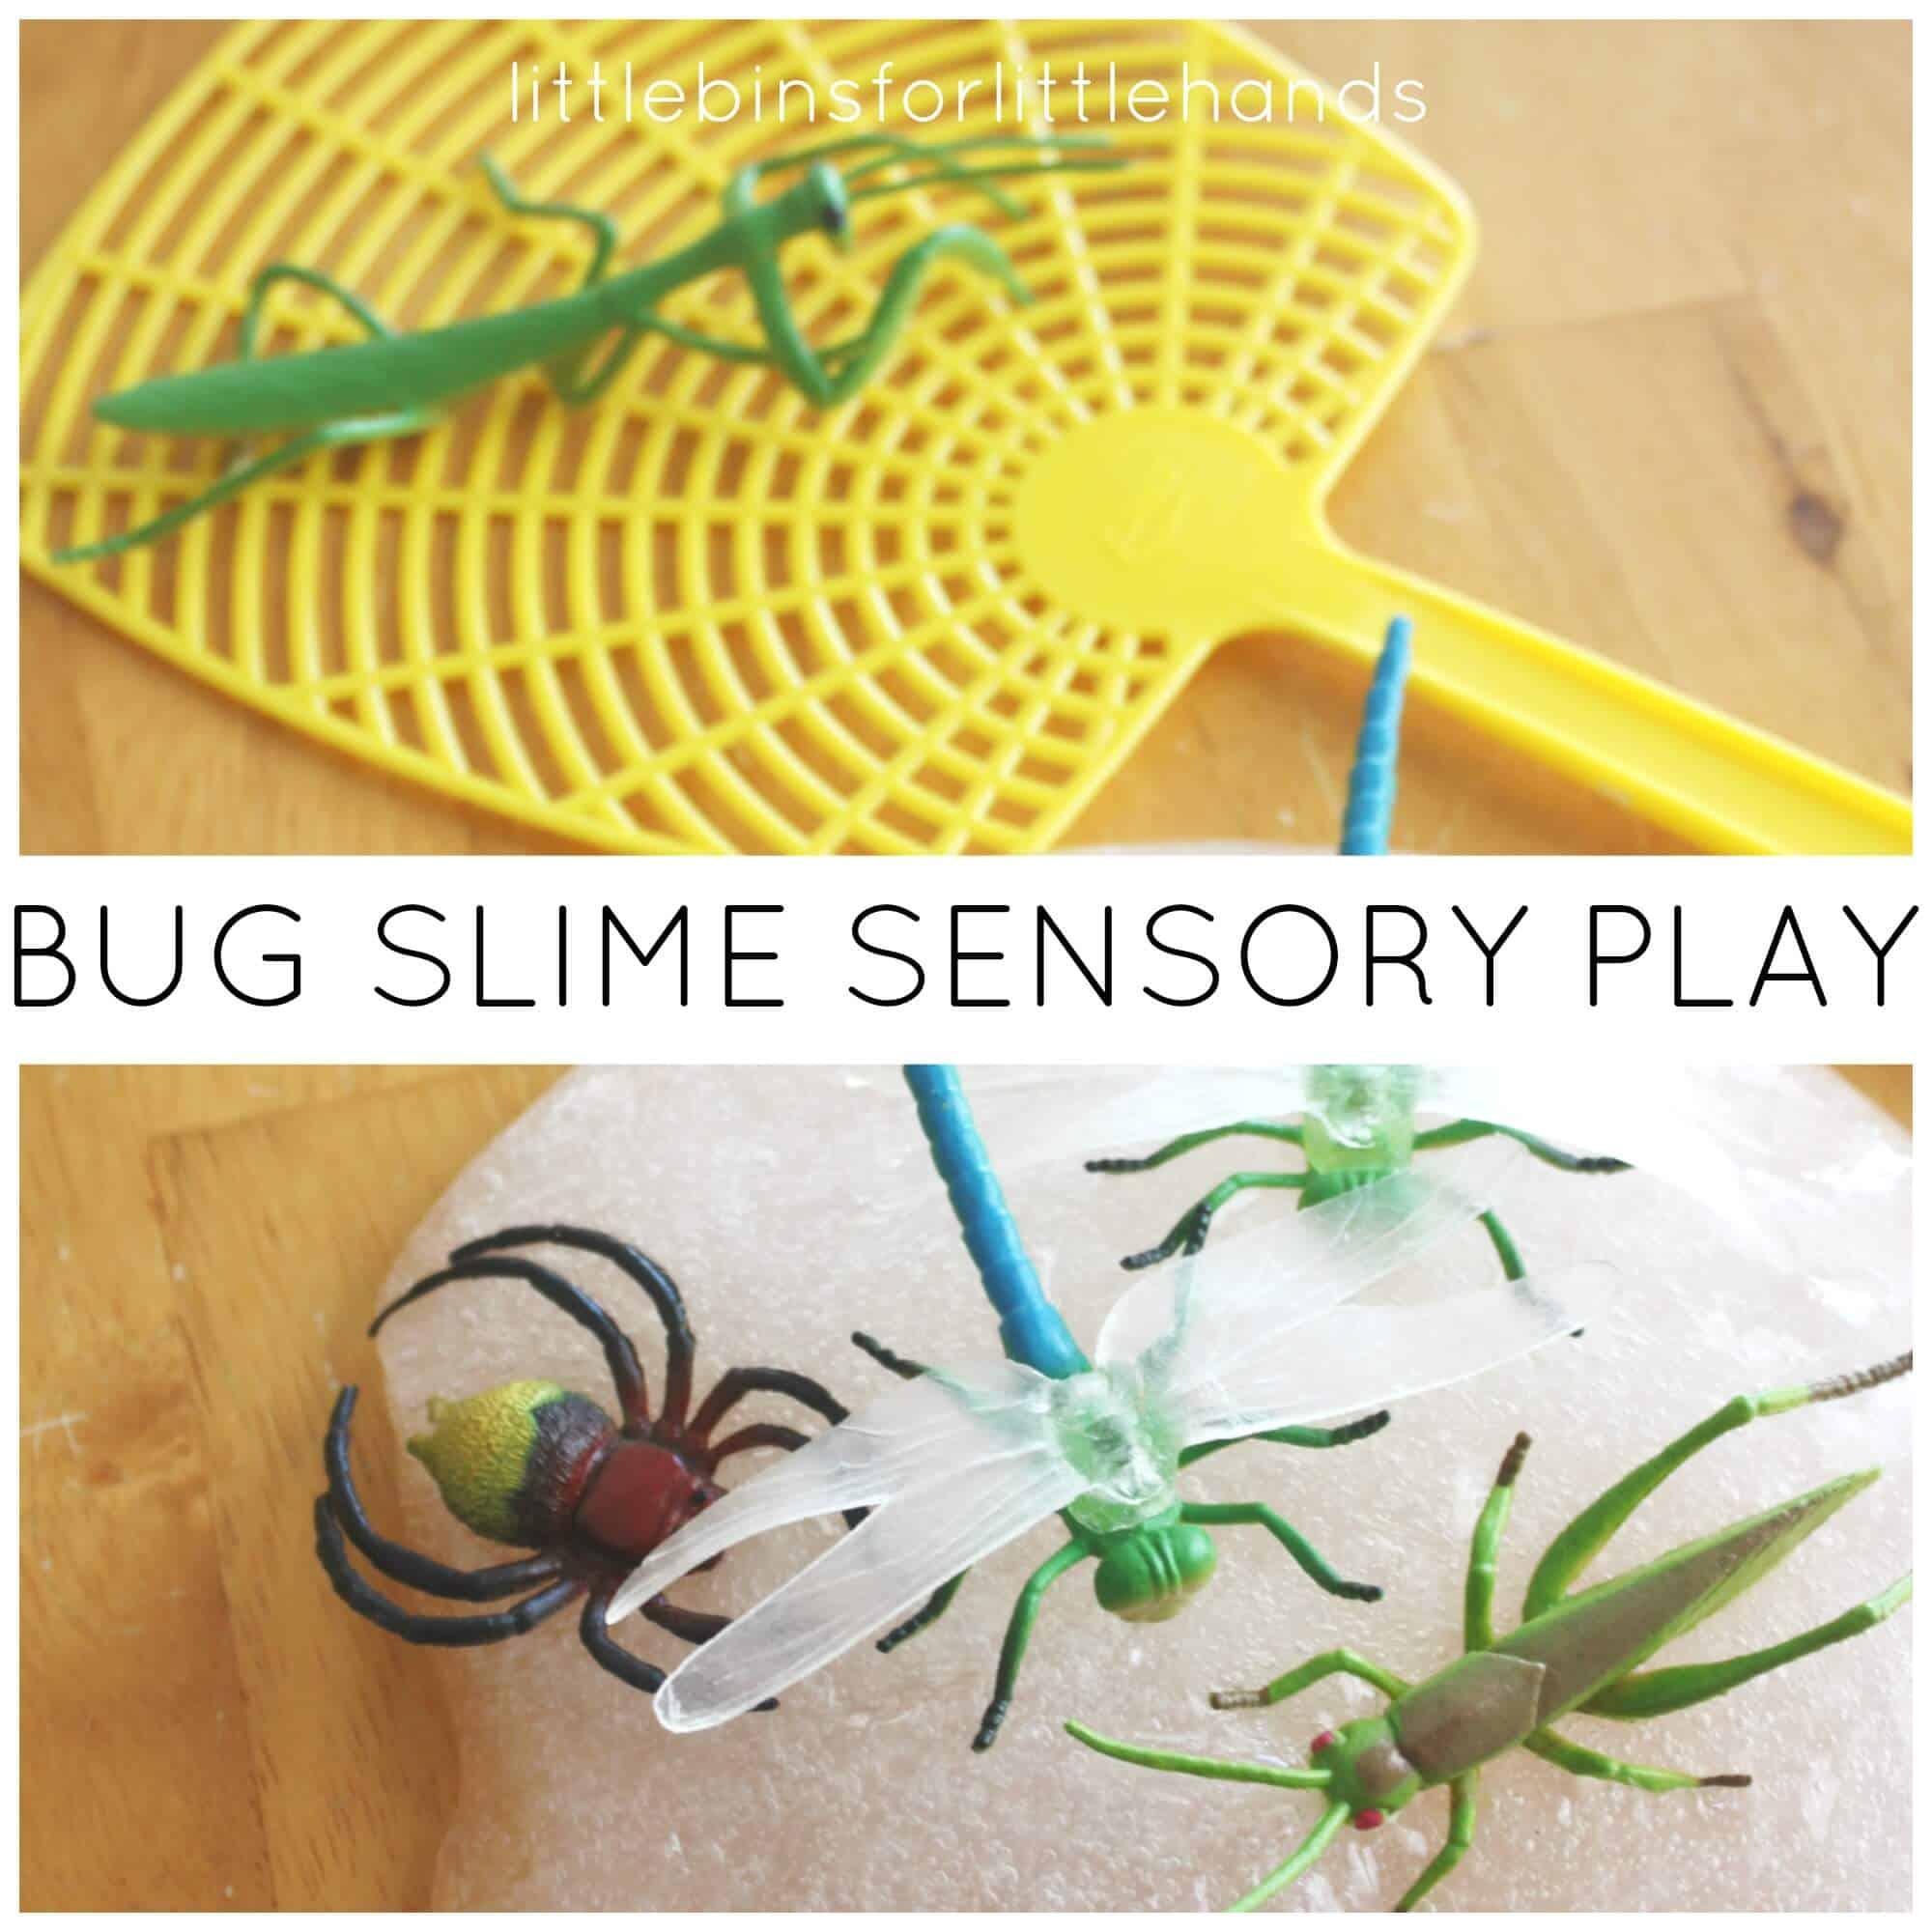 Bug Slime Science Spring Sensory Play Activity